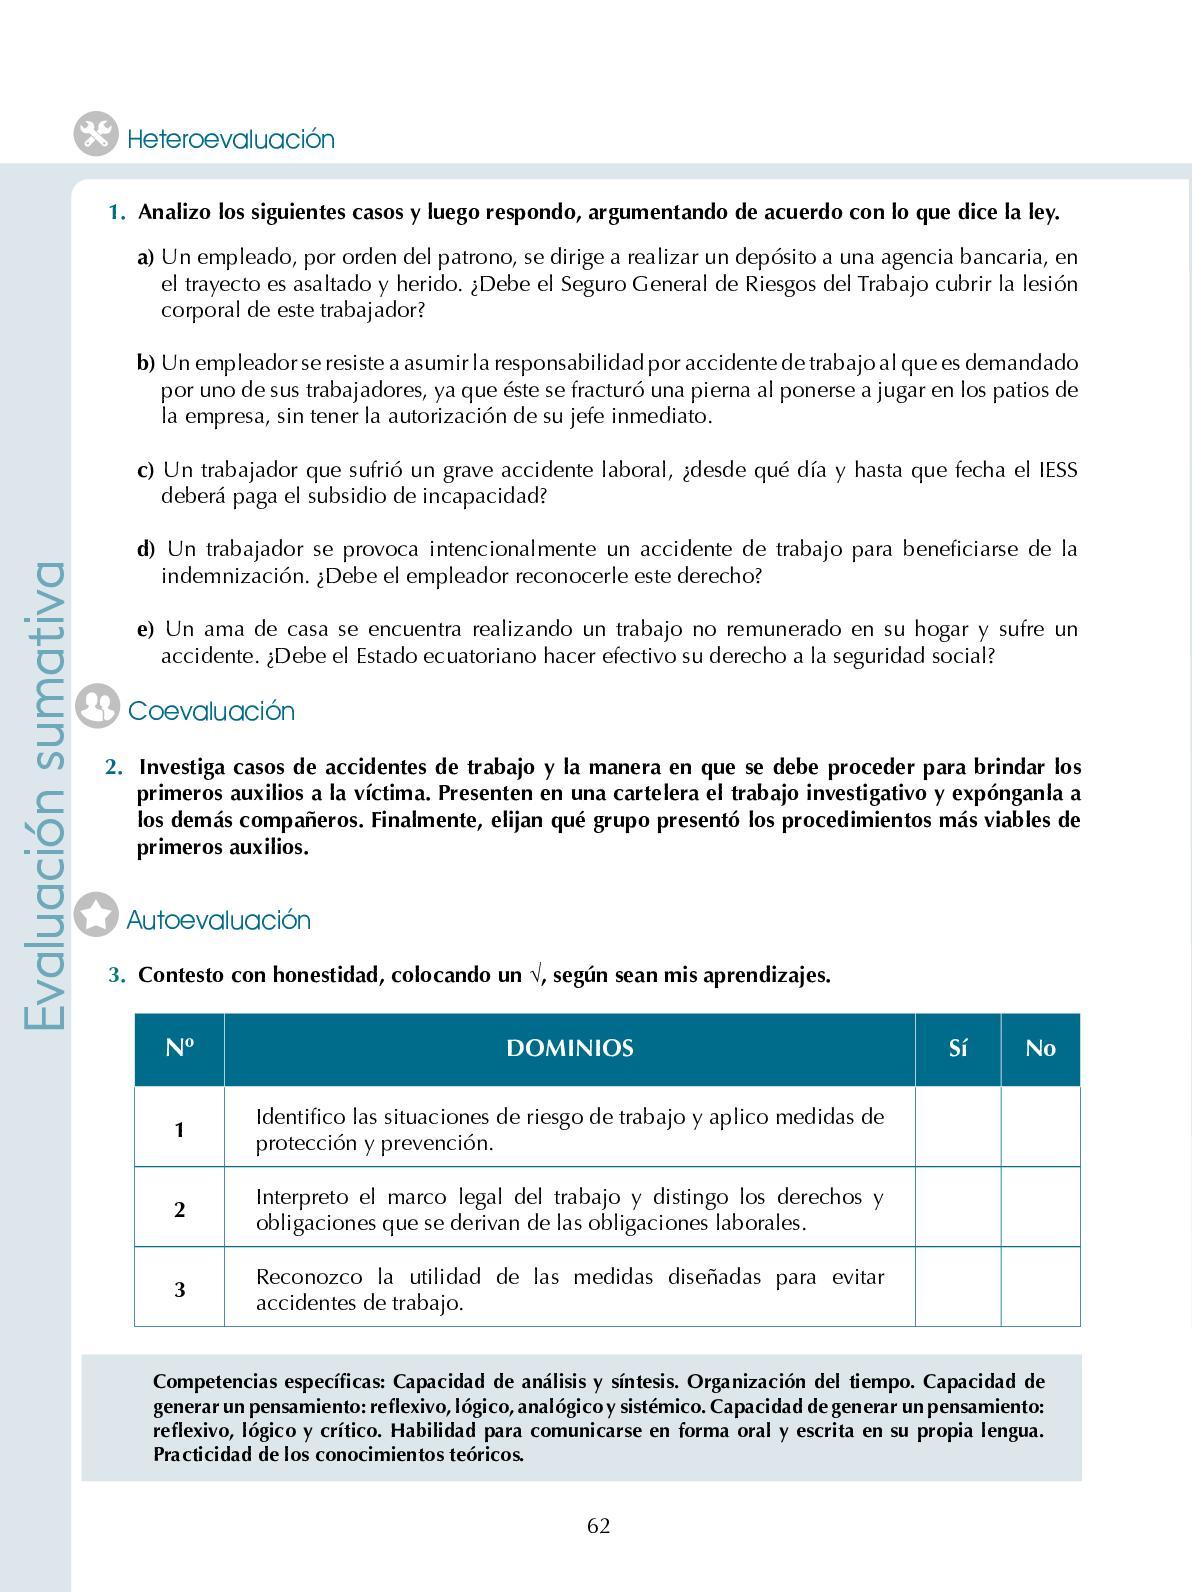 Fol 2019 Calameo Downloader